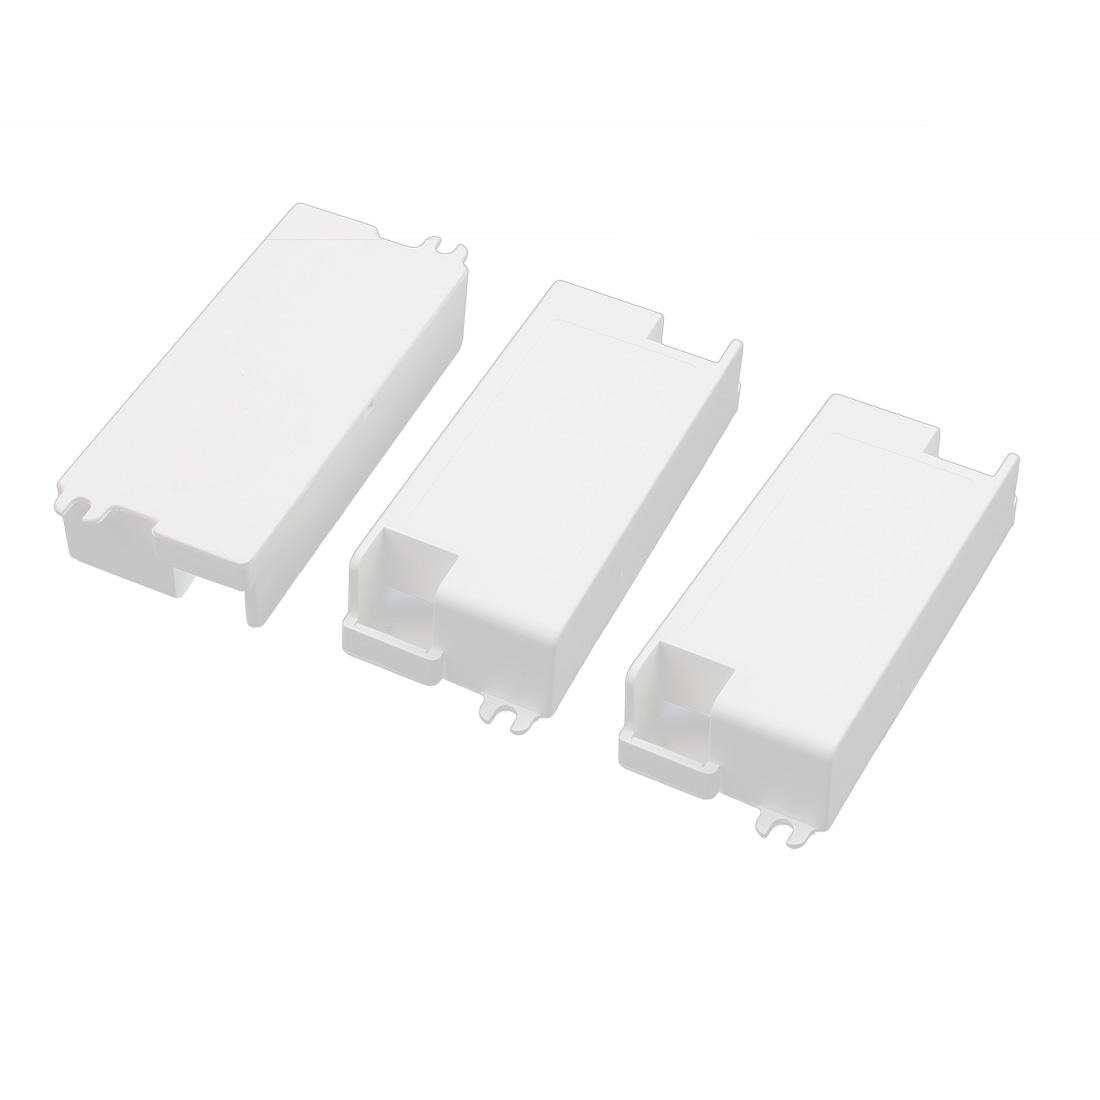 3Pcs XL-125 115x48x26mm PC Flame Retardant Enclosure Junction Box for LED Driver